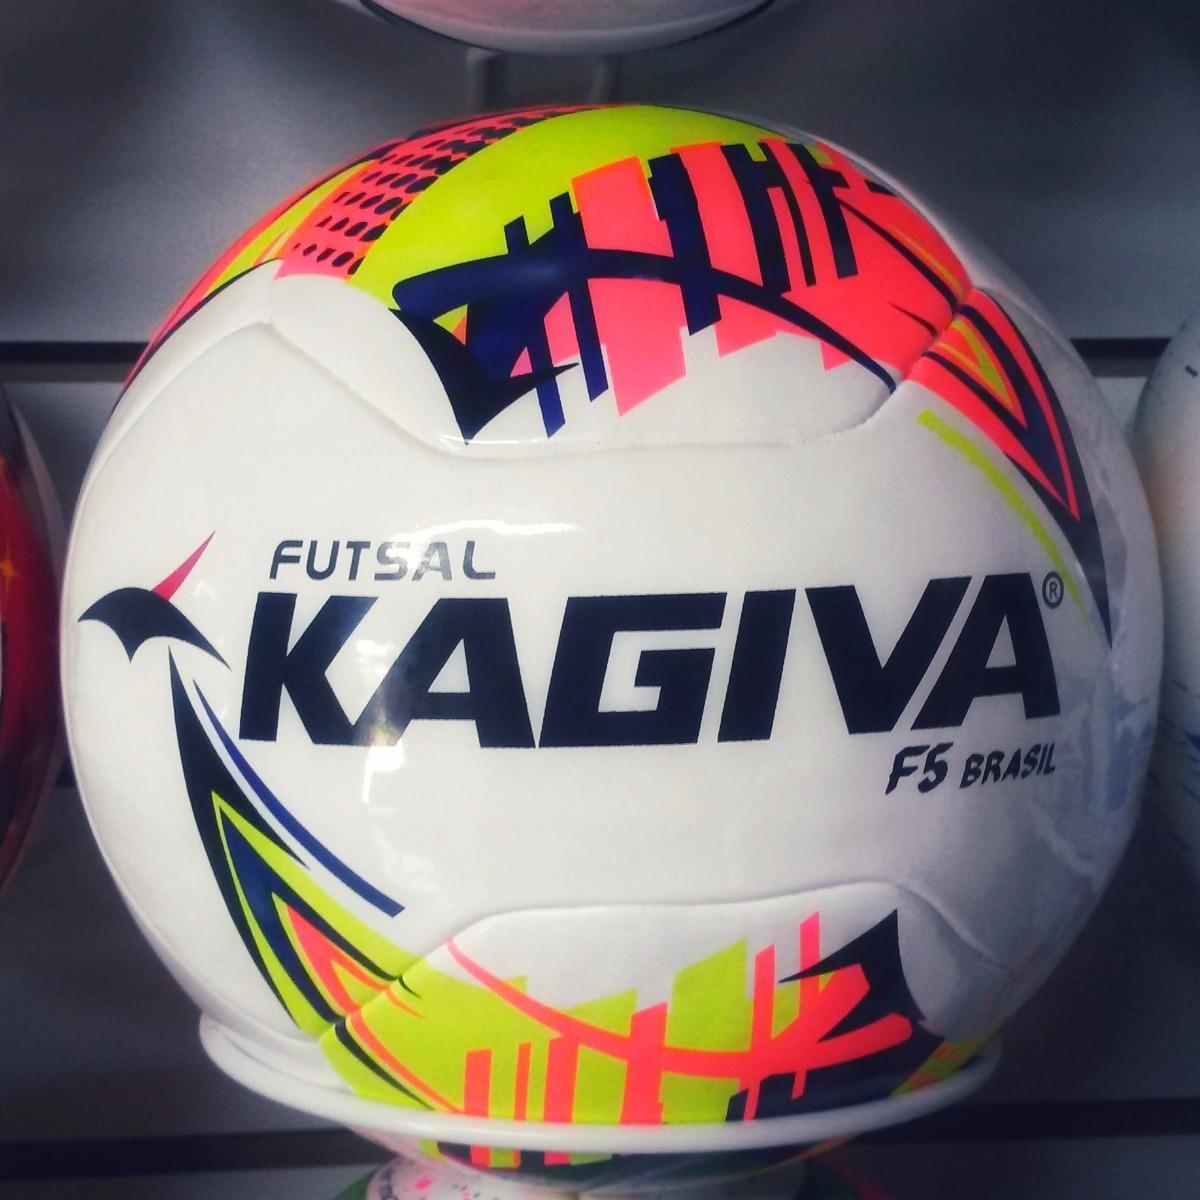 d4c04da275c03 4 bolas de futsal kagiva f5 brasil pro. Carregando zoom.